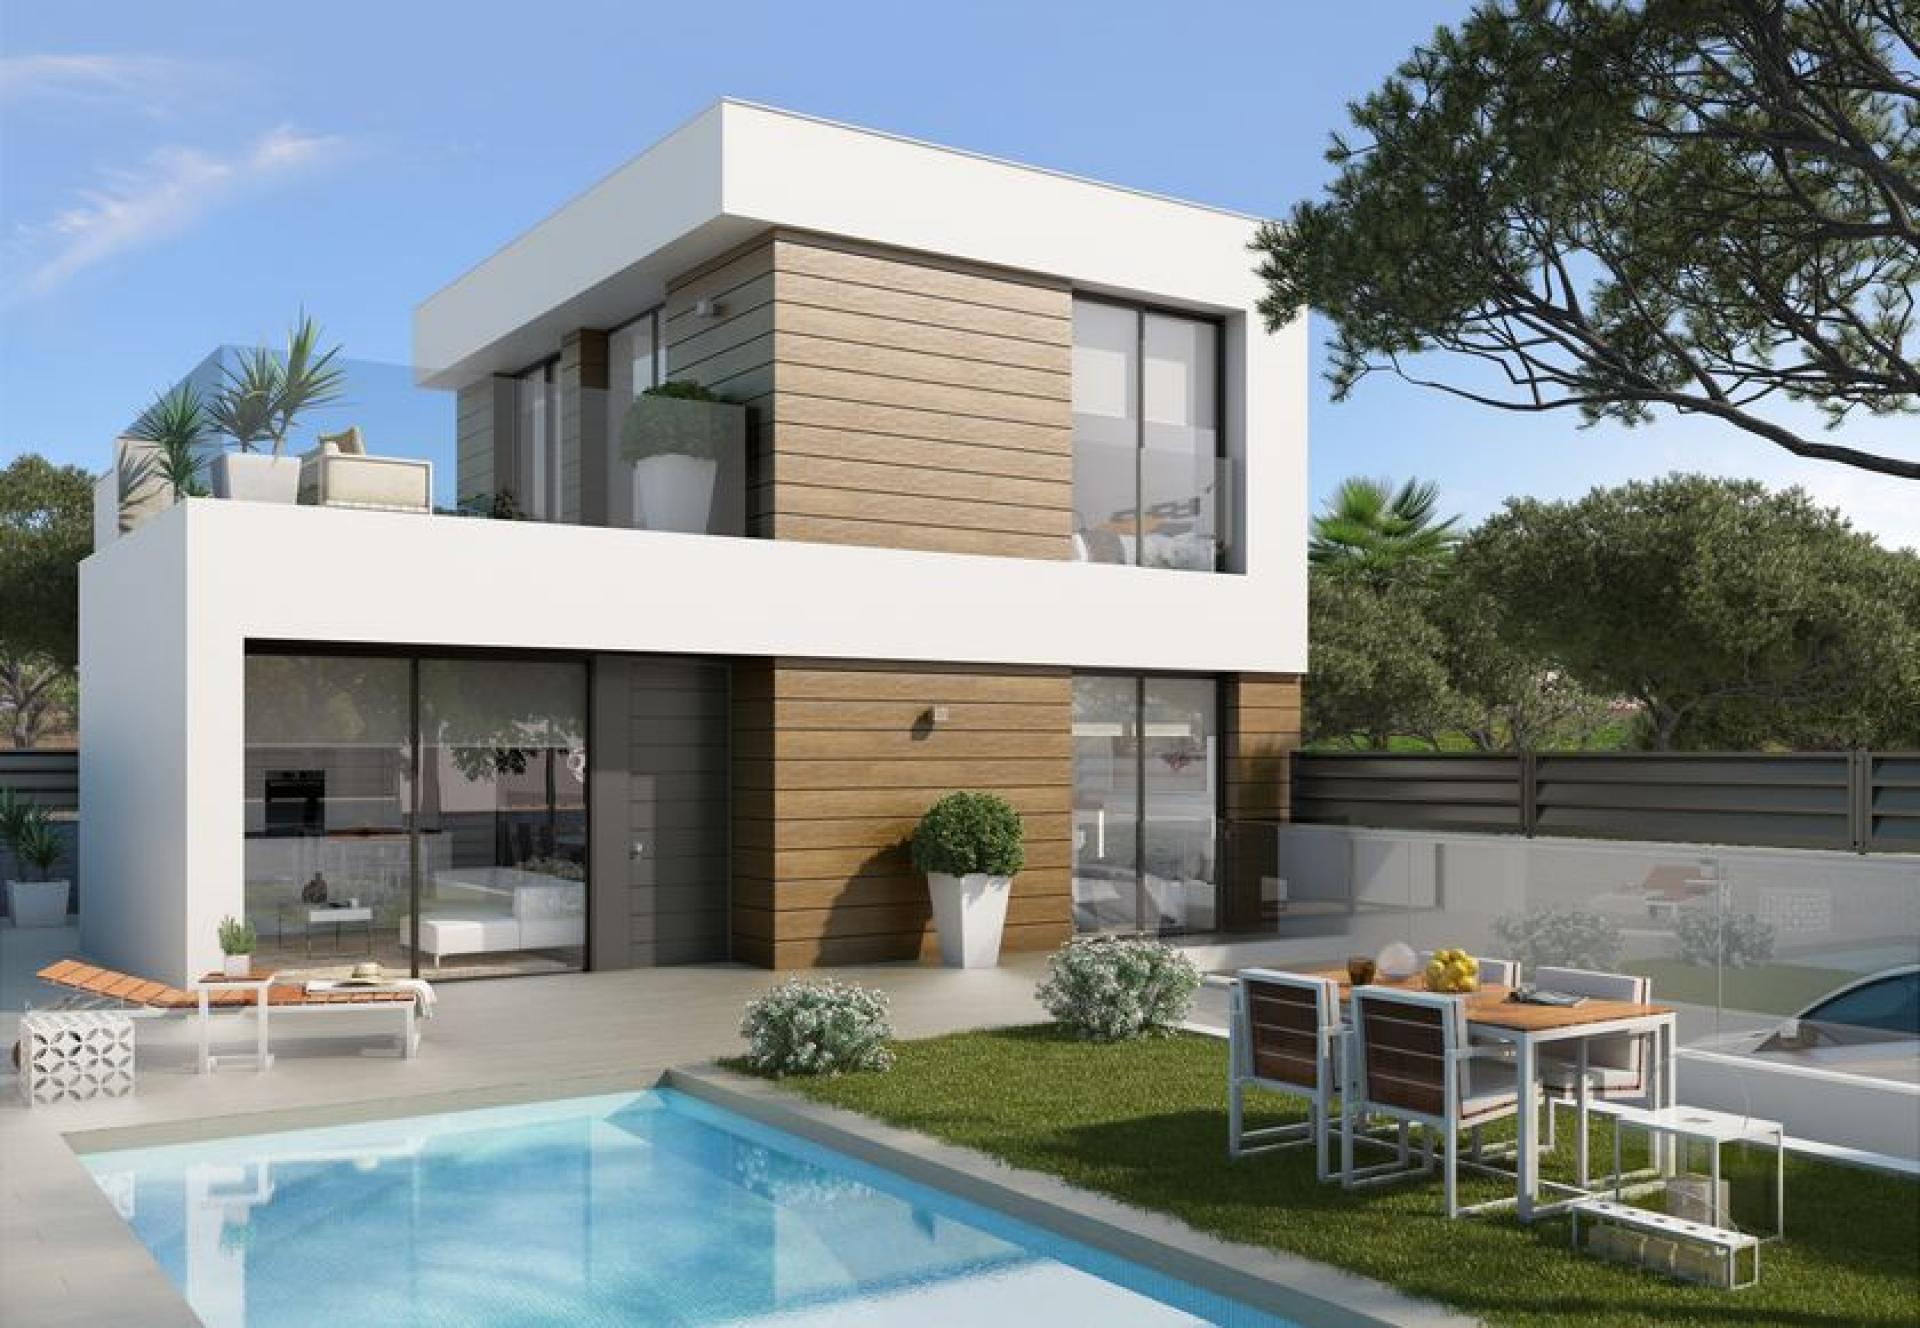 3 Slaapkamer Villa in El Campello - Nieuwbouw in Medvilla Spanje